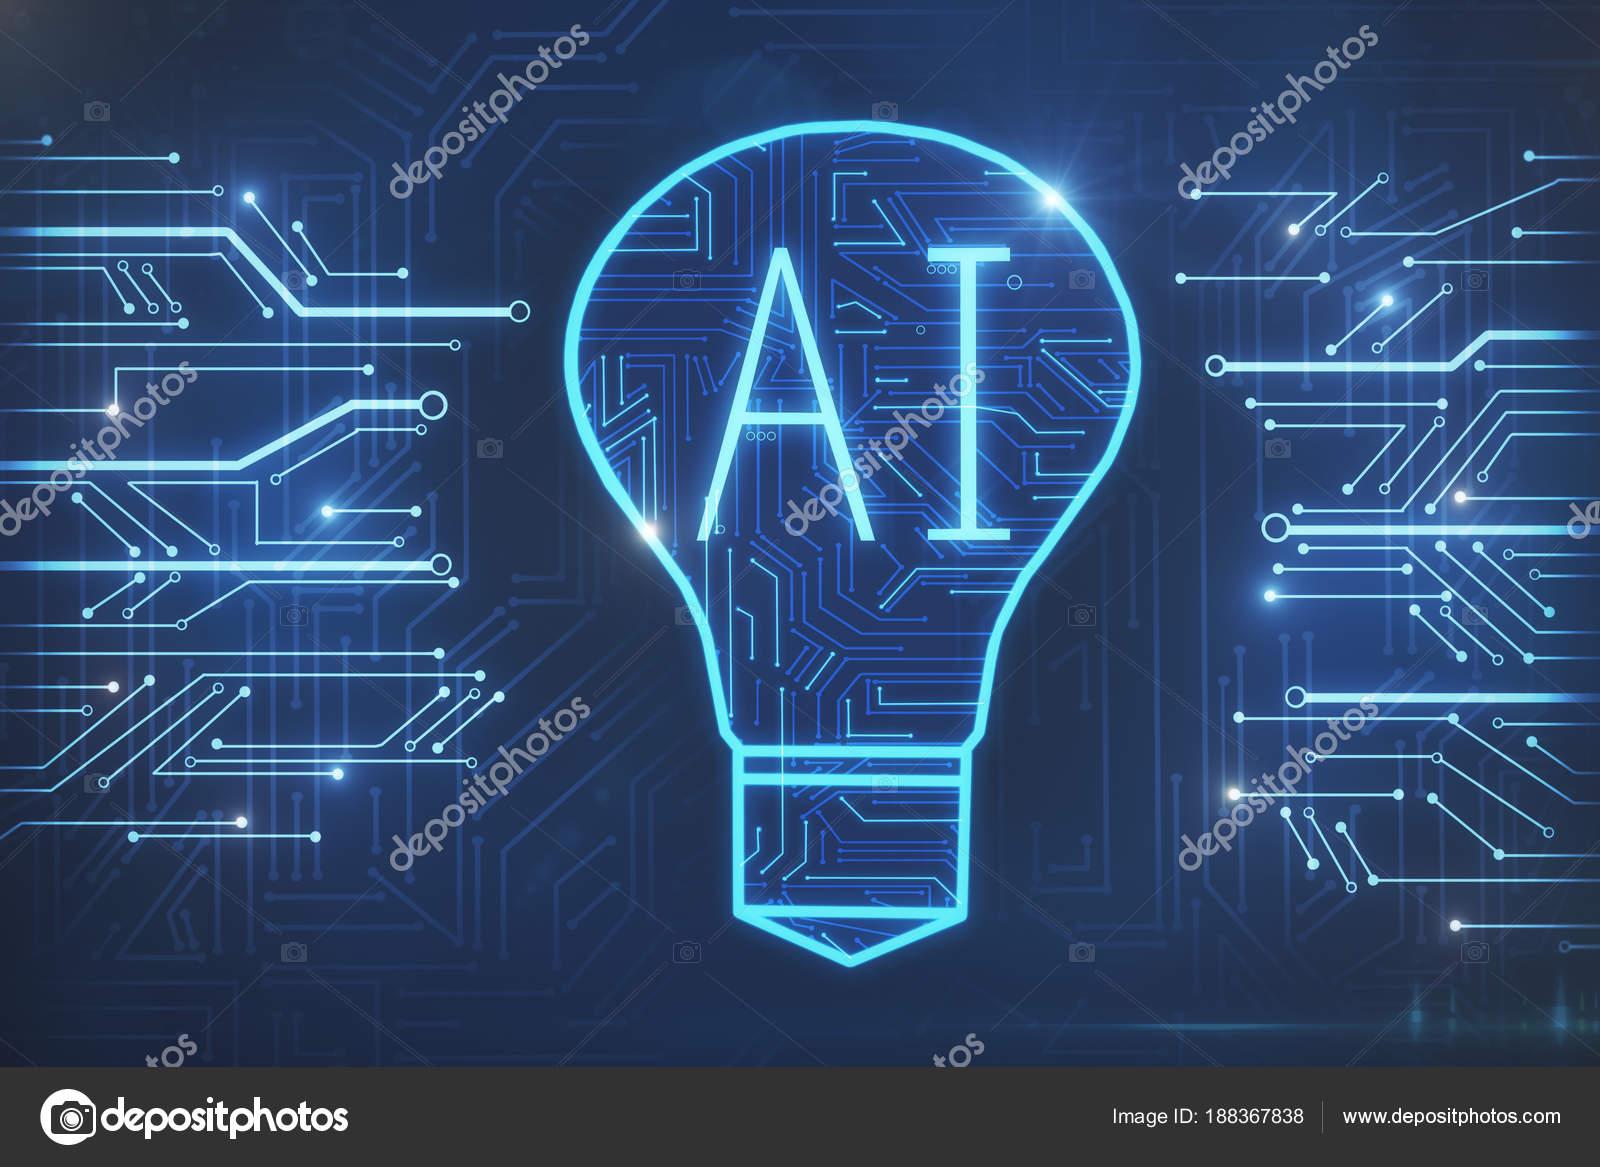 Unduh 810+ Background Artificial Intelligence Terbaik